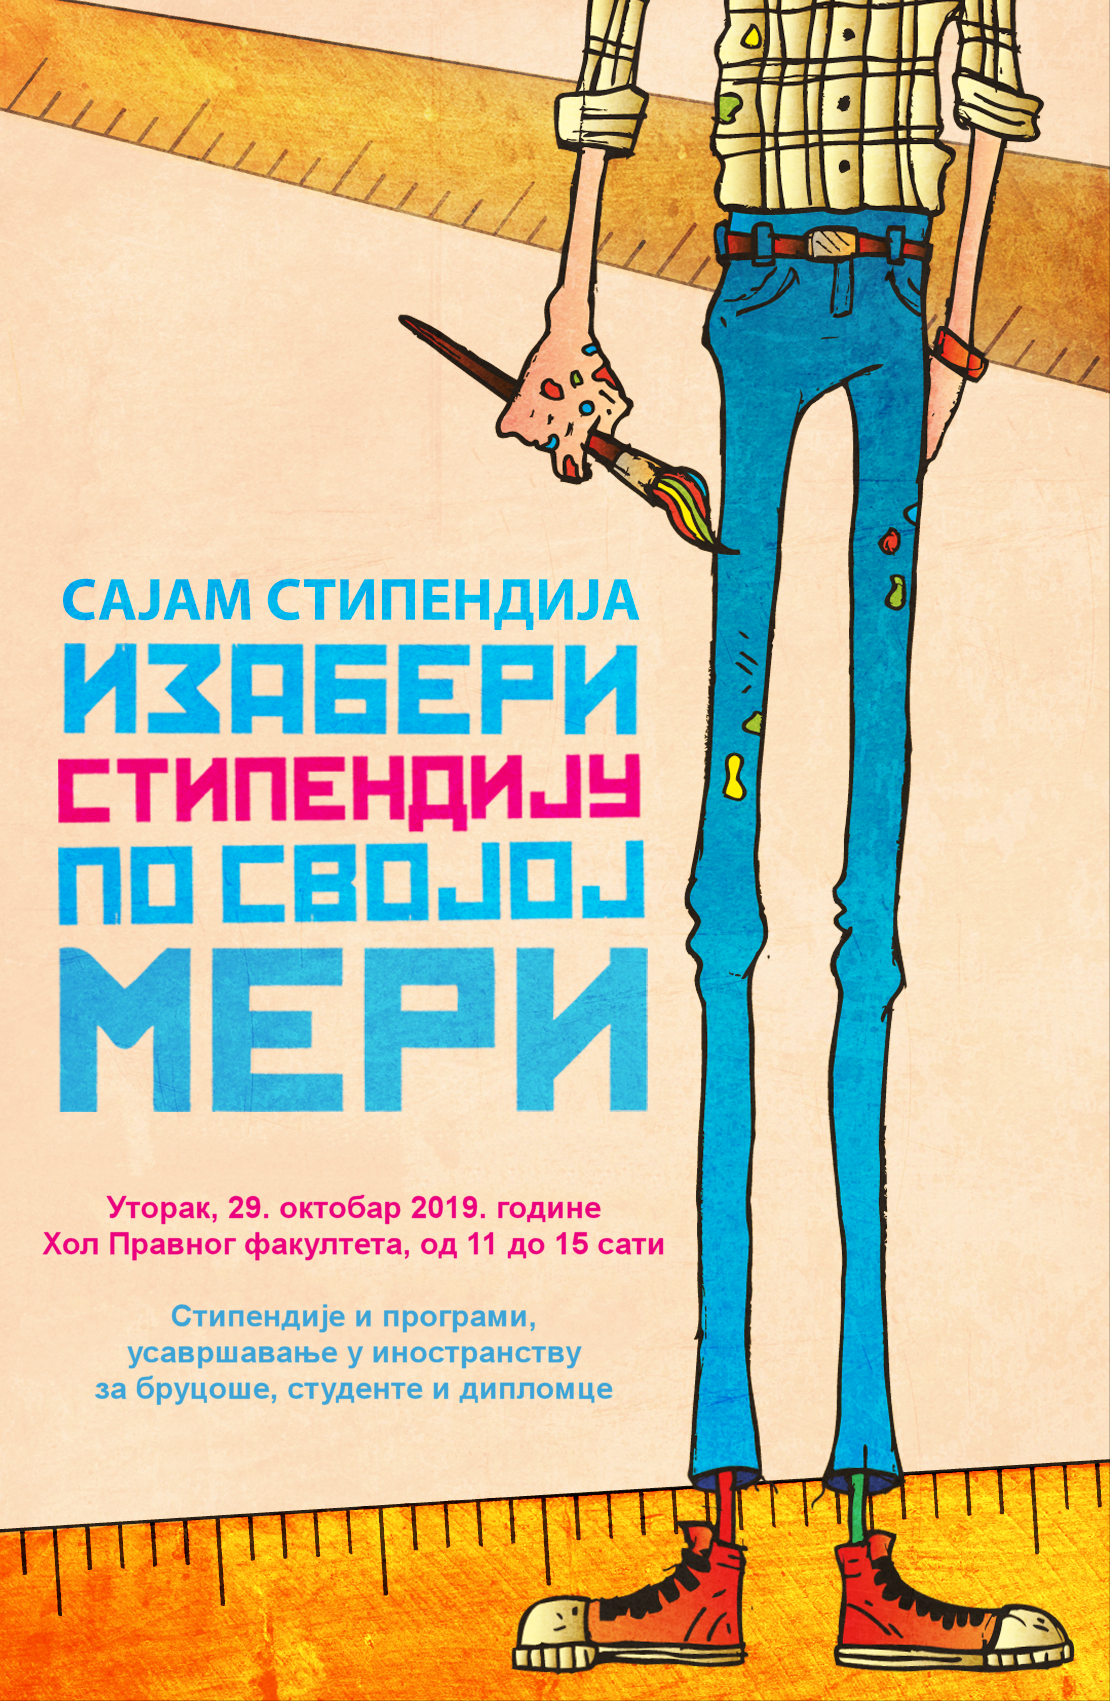 Фонд за младе таленте на Сајму стипендија у Крагујевцу